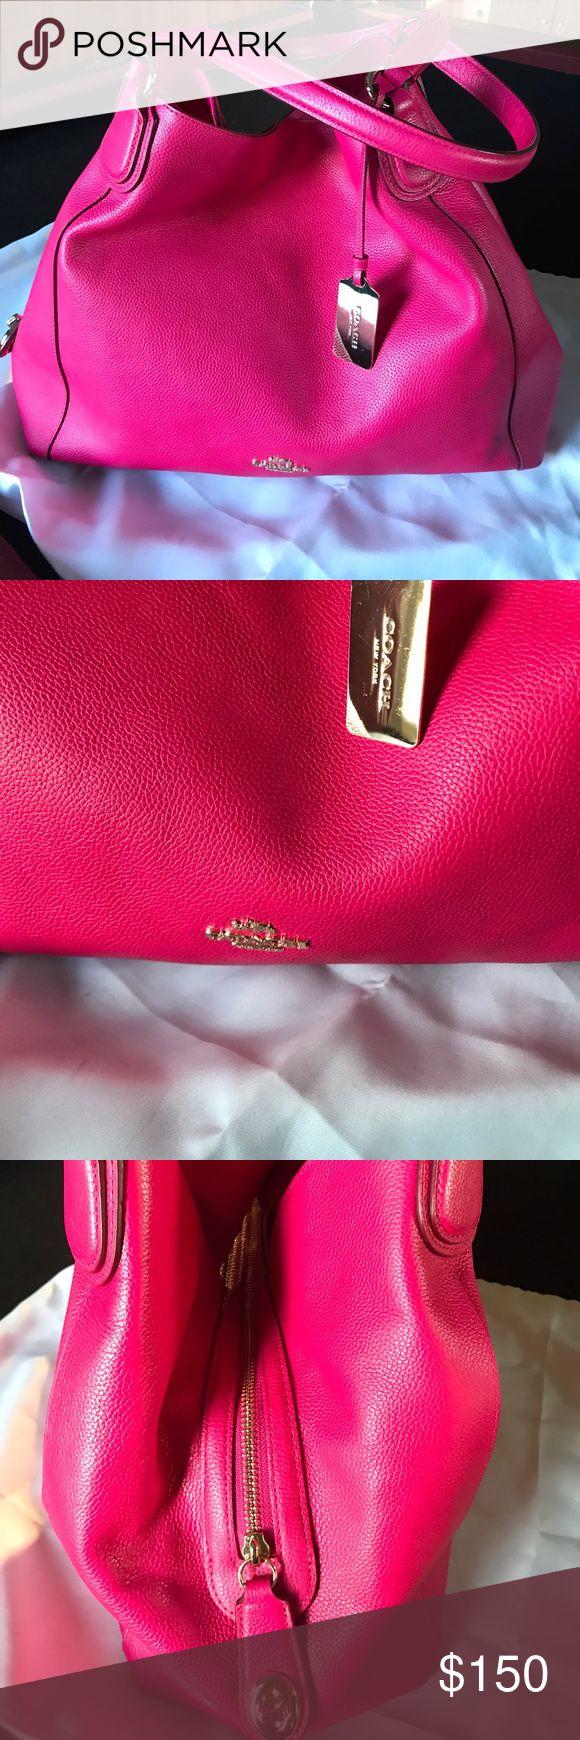 Coach handbag like new bright pink soft leather🌷 Coach handbag like new bright pink soft leather🌷 no marks tears looks new! Lotsa space! Comes w dust bag! Coach Bags